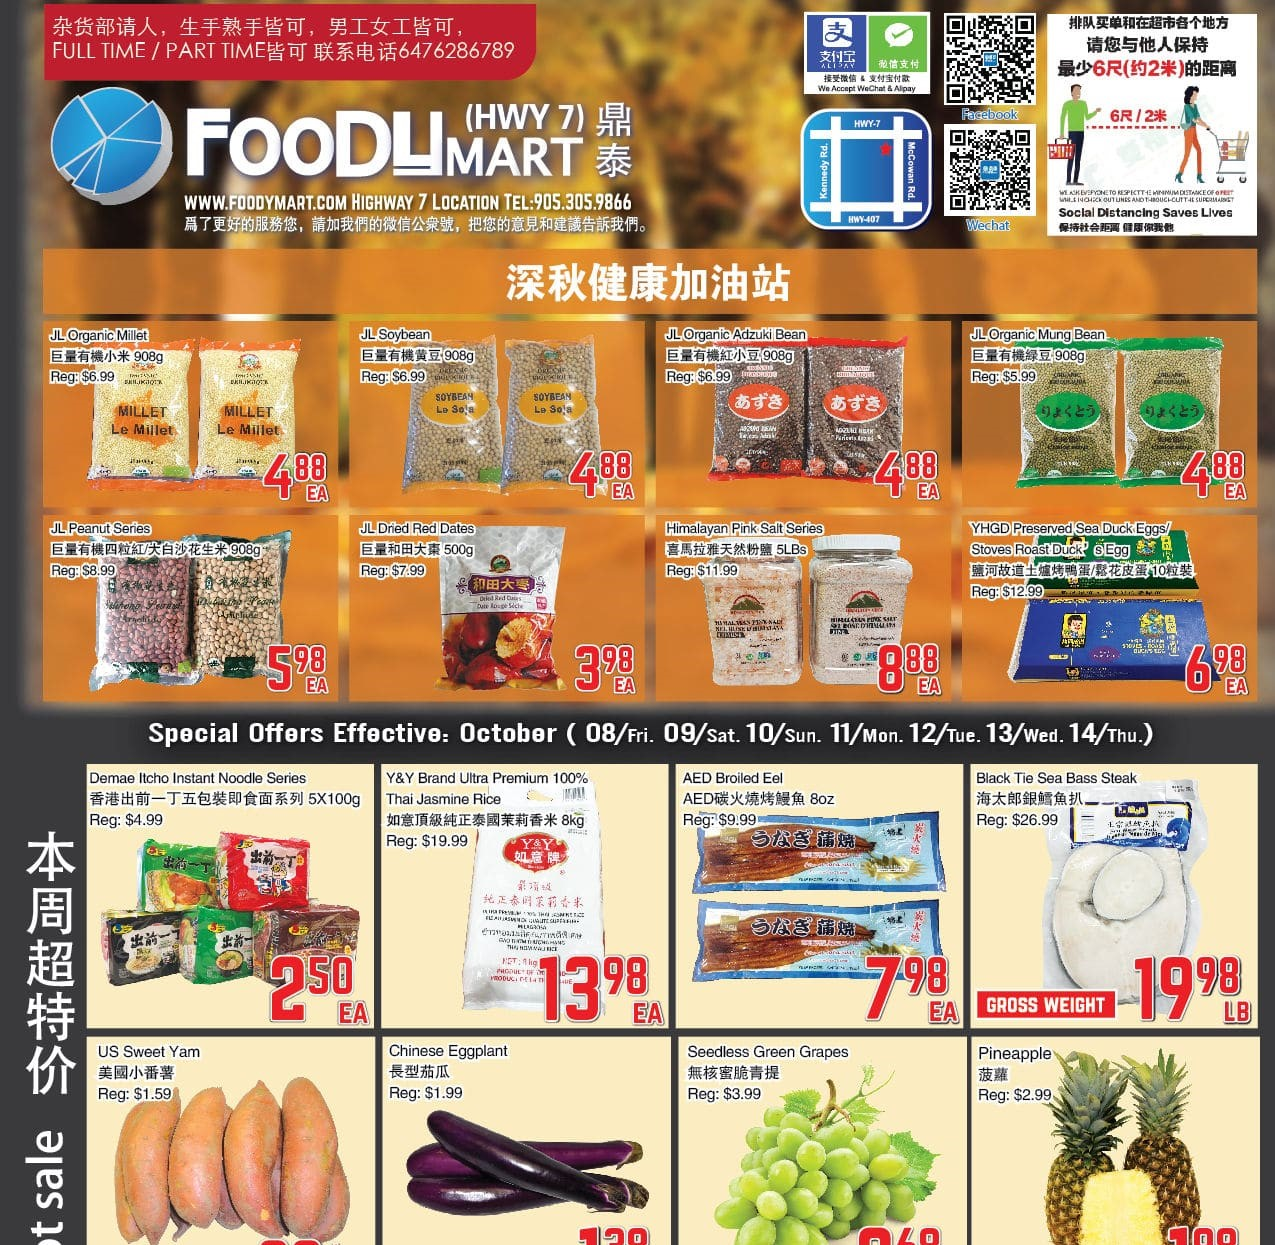 Foody Mart Warden Flyer | Oct 8